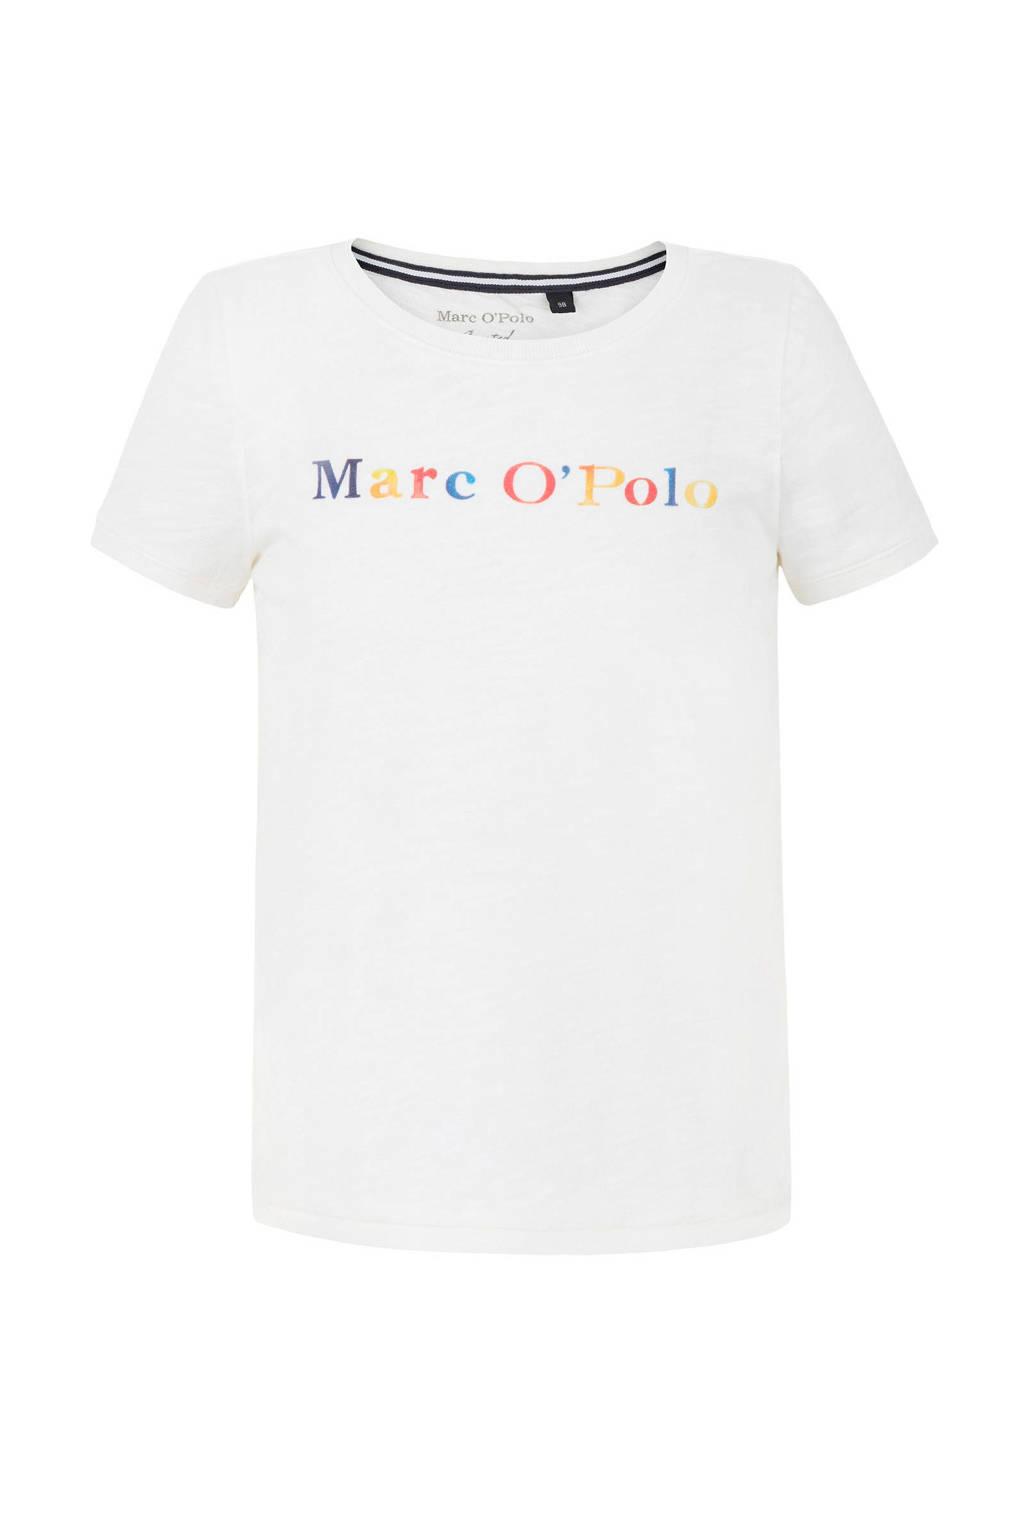 Marc O'Polo T-shirt met tekst wit, Wit